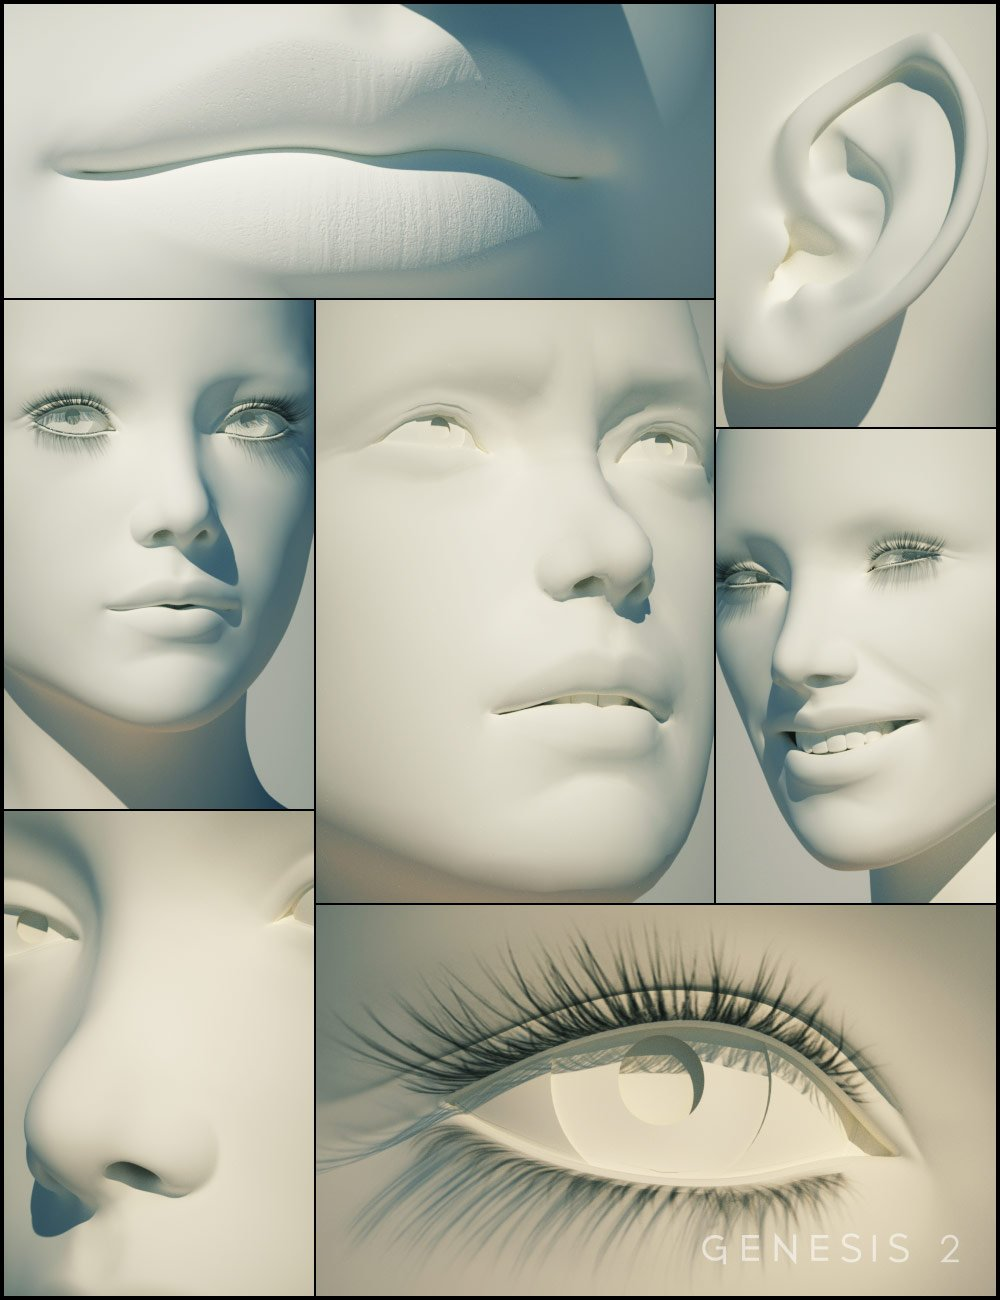 Genesis 2 Female Head Morphs by: , 3D Models by Daz 3D